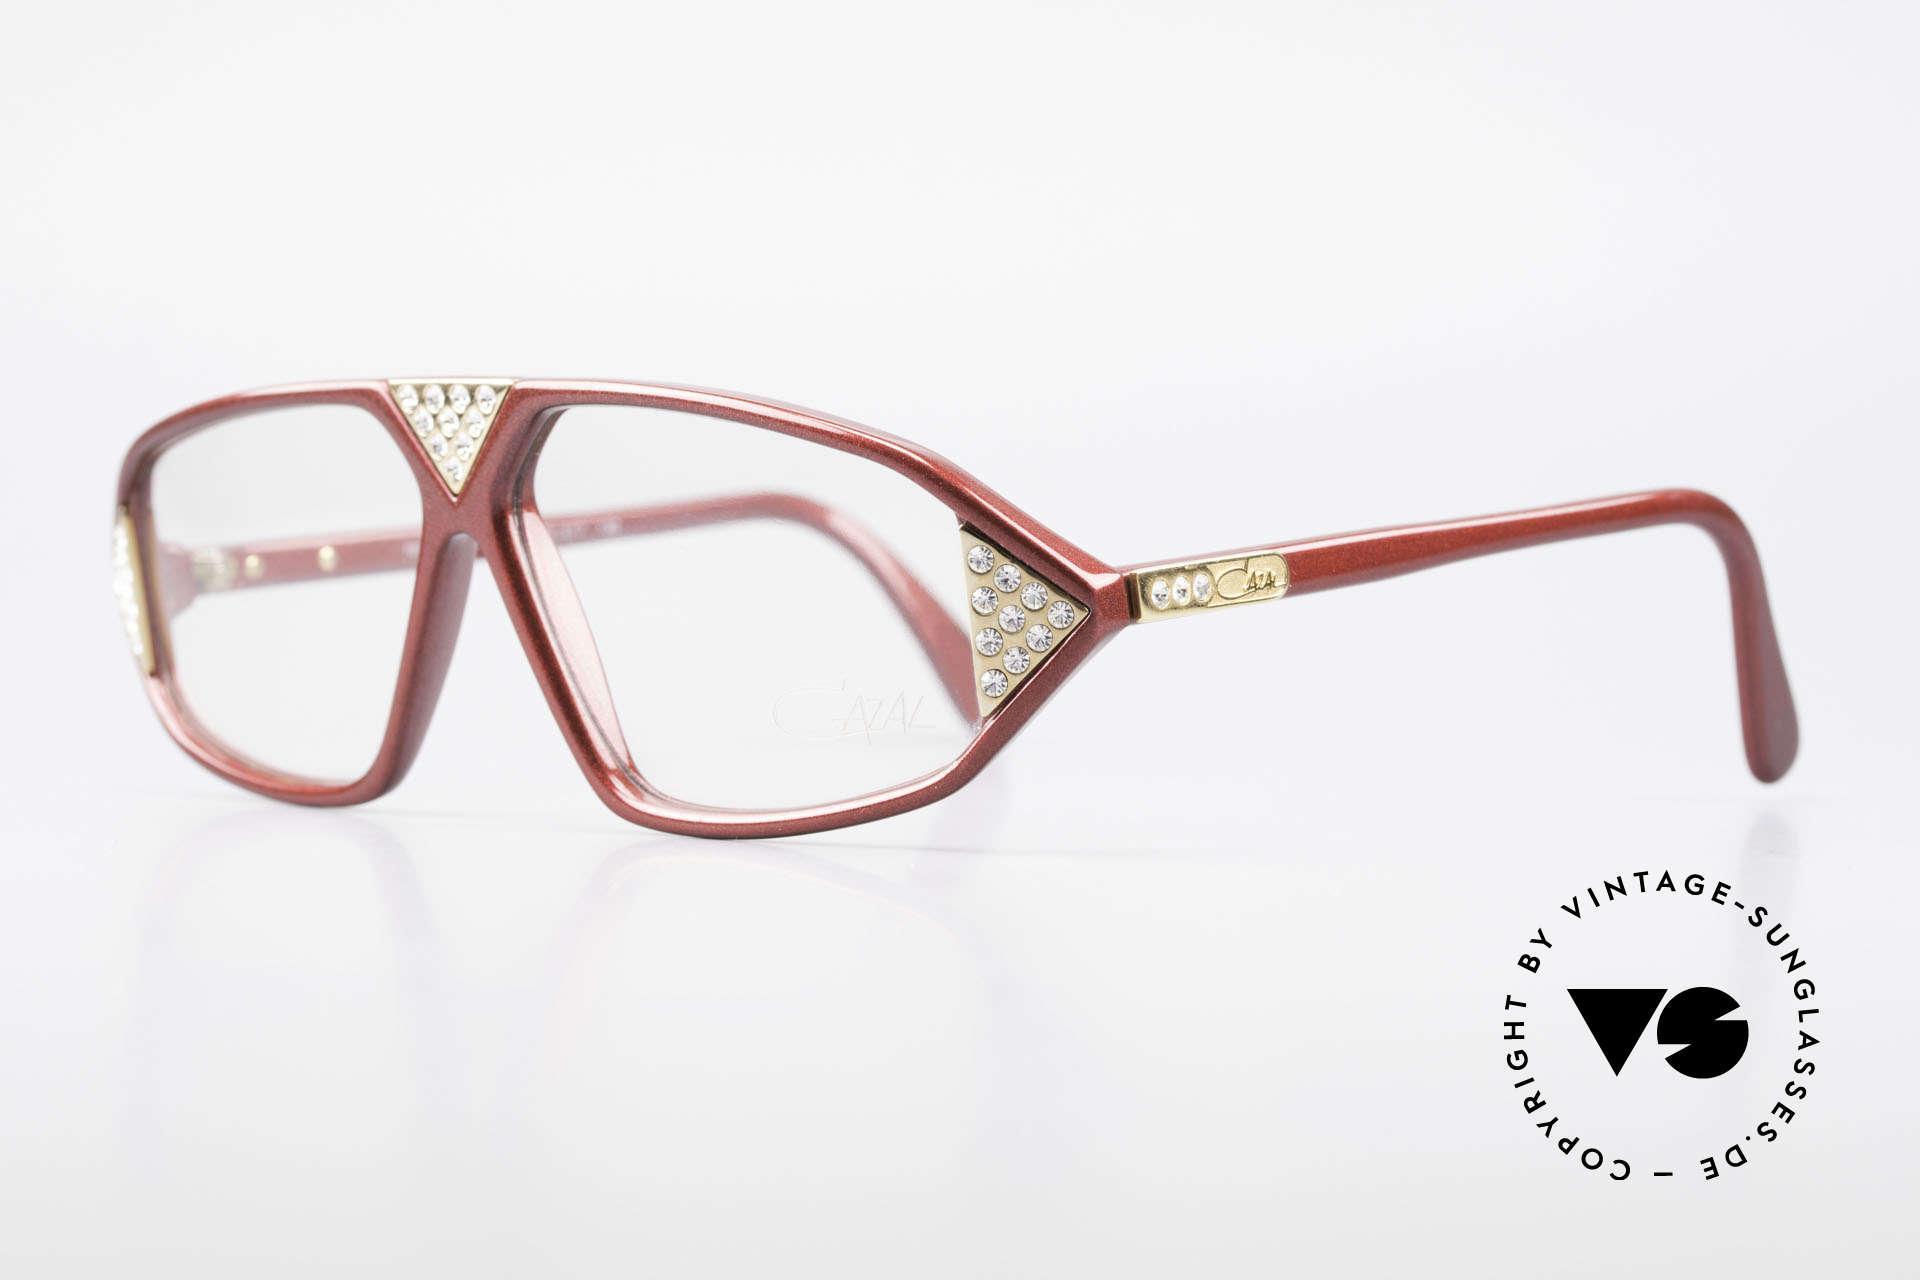 Cazal 199 80's Rhinestone Eyeglasses, noble rhinestone appliqué on the red frame, Made for Women